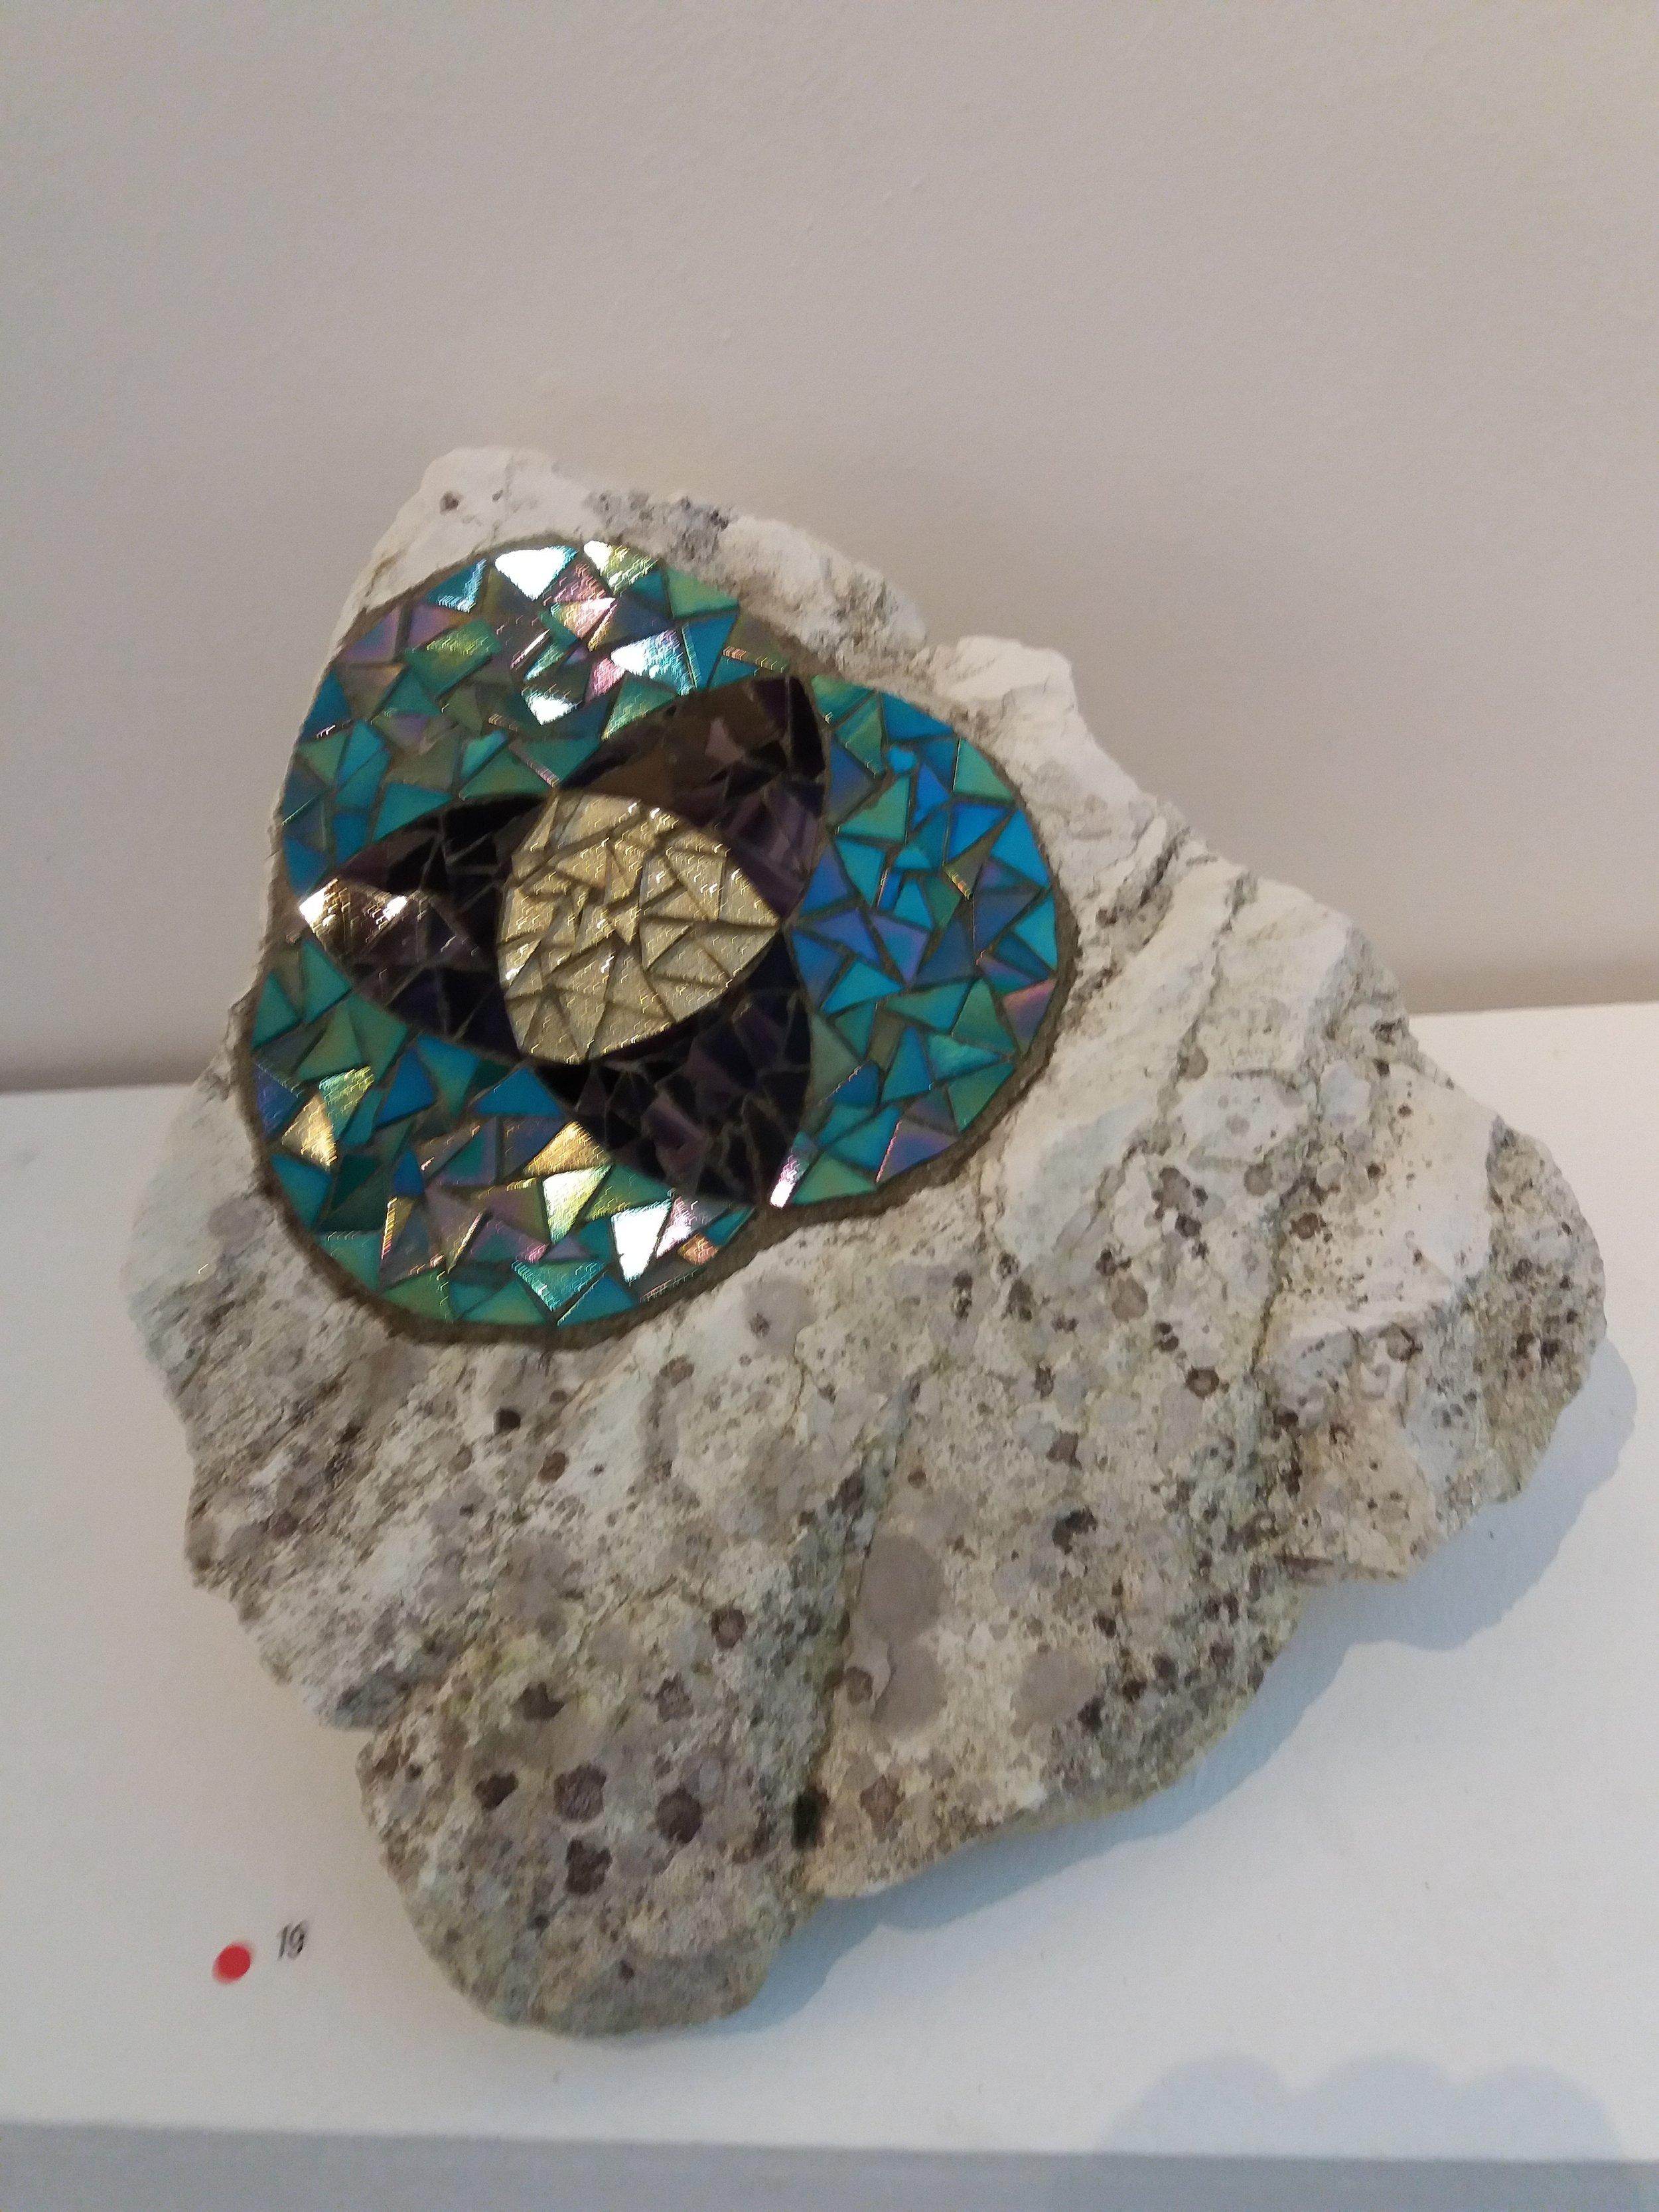 Celtic spiral mosaic rock